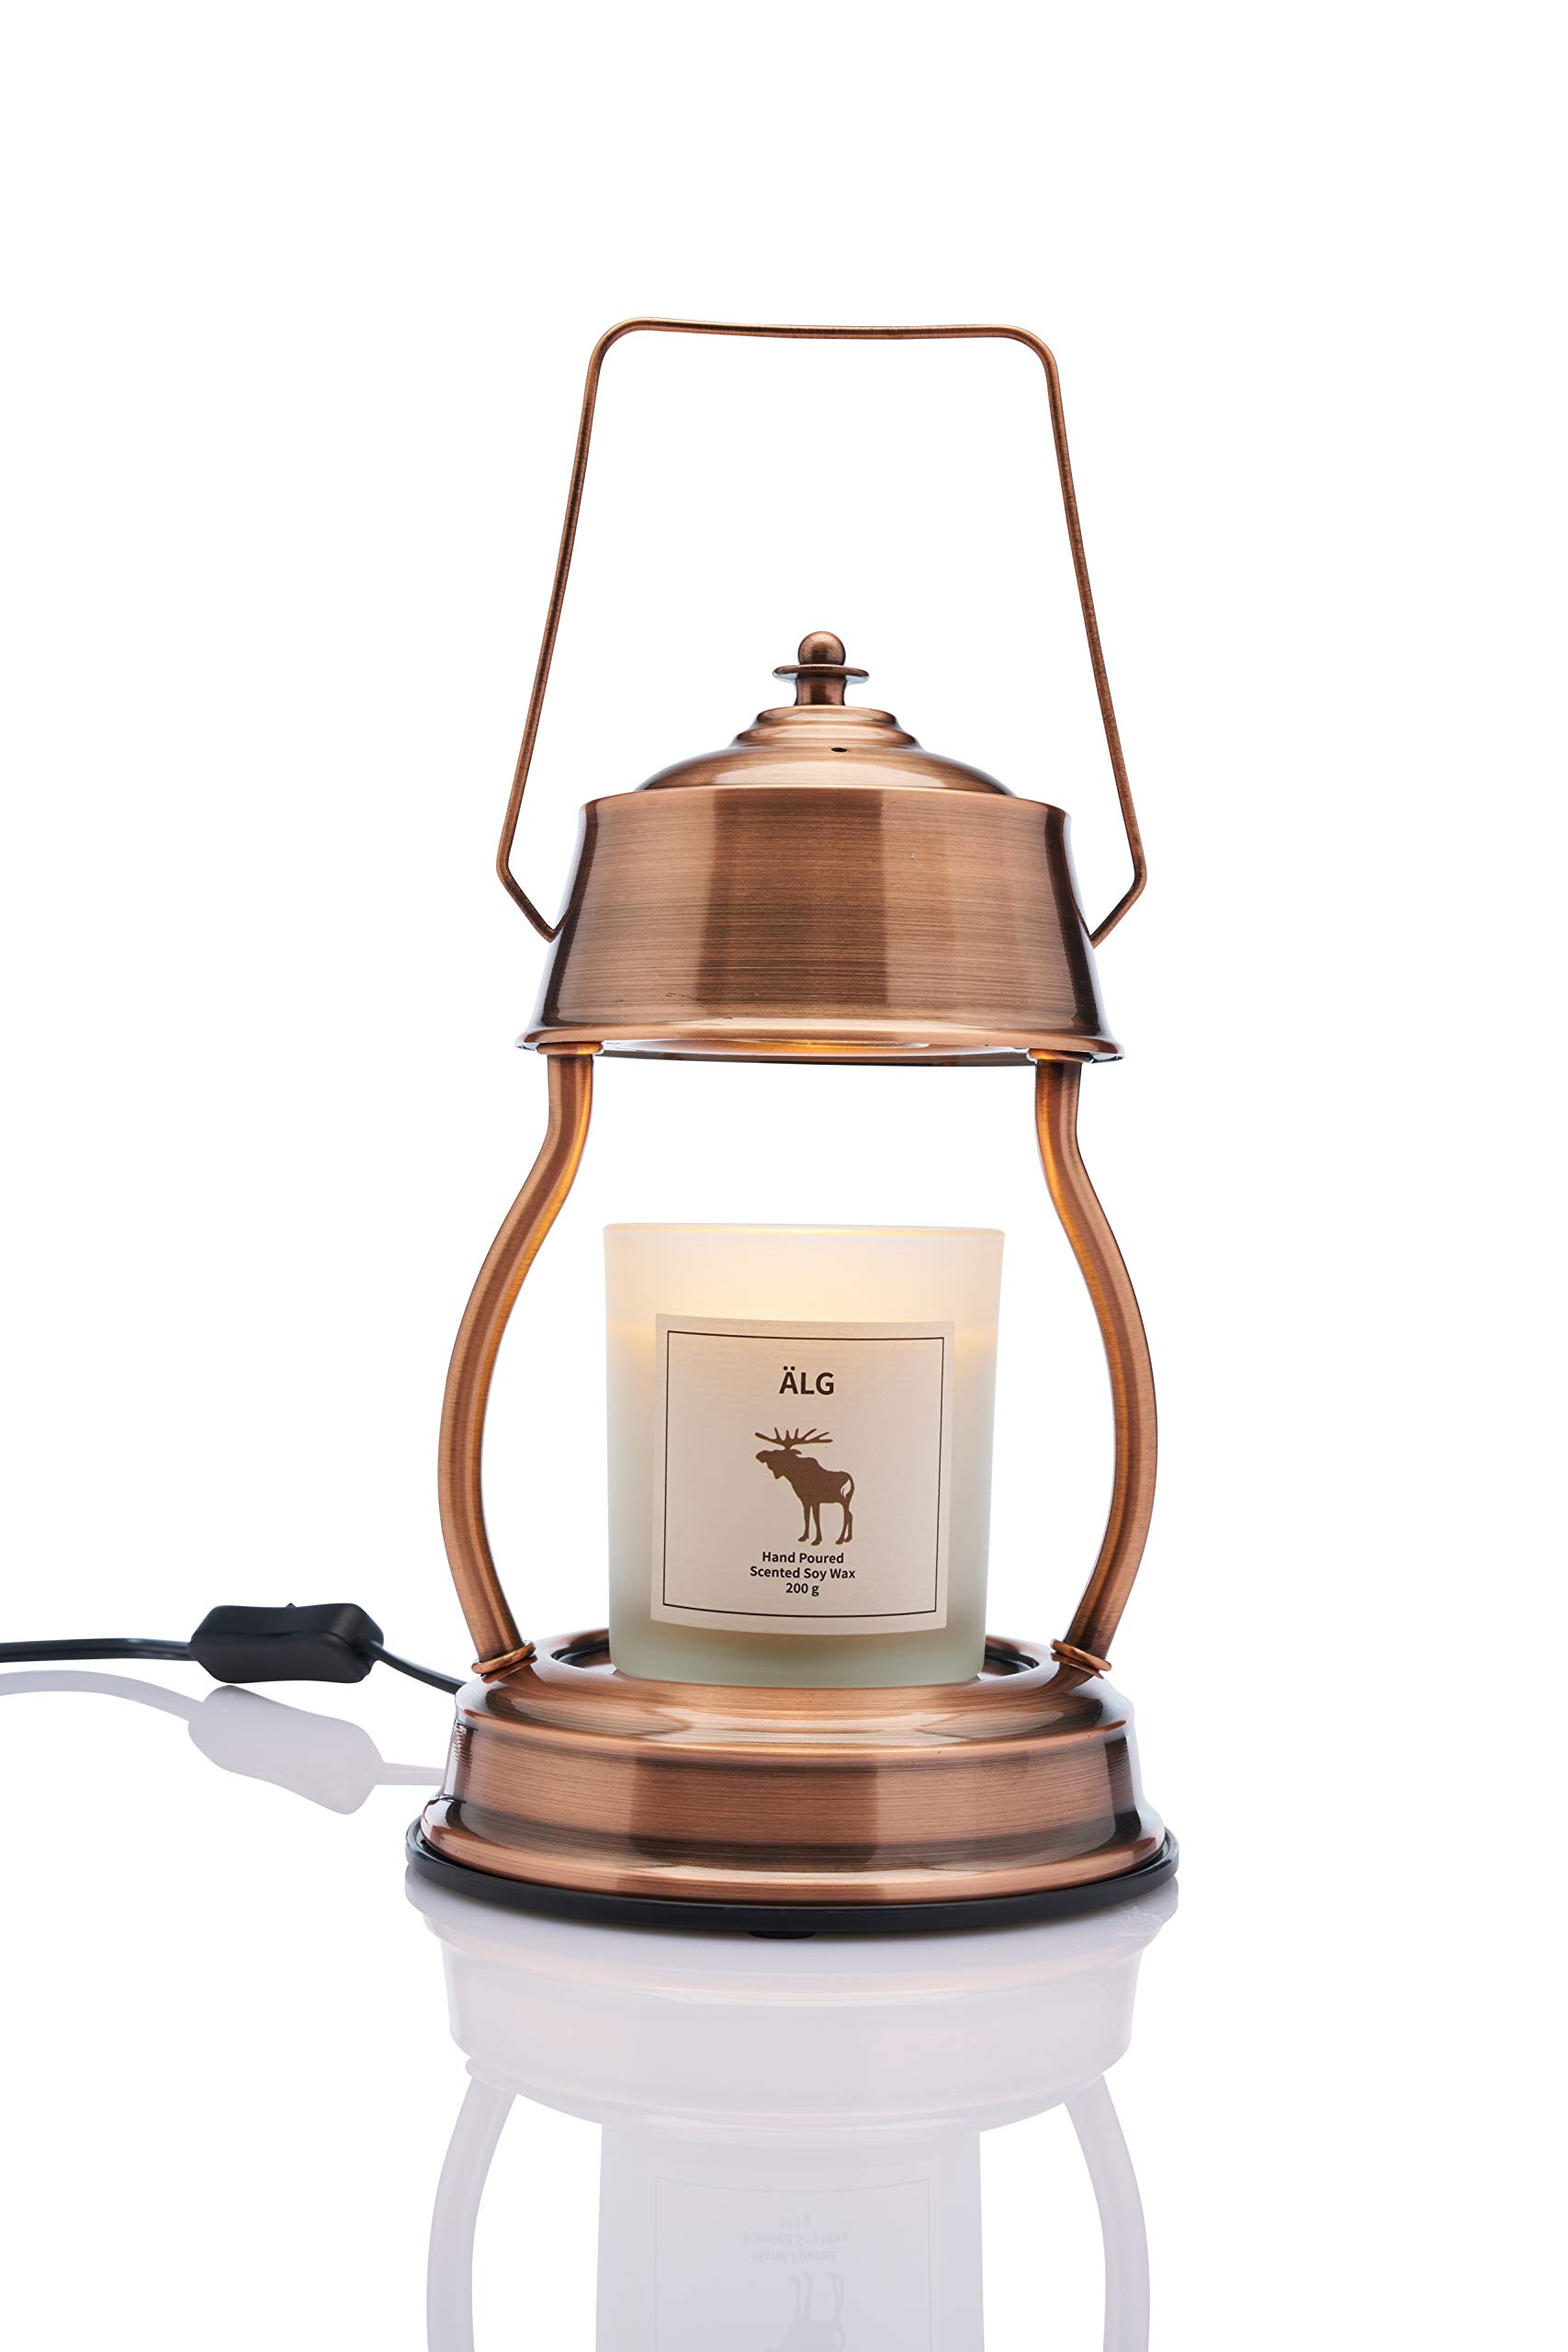 Vana Candles Candle Warmer Ljusvärmare Lykta Vintage Lamp Lantern Swedish Design - Brushed Metal Rose Gold